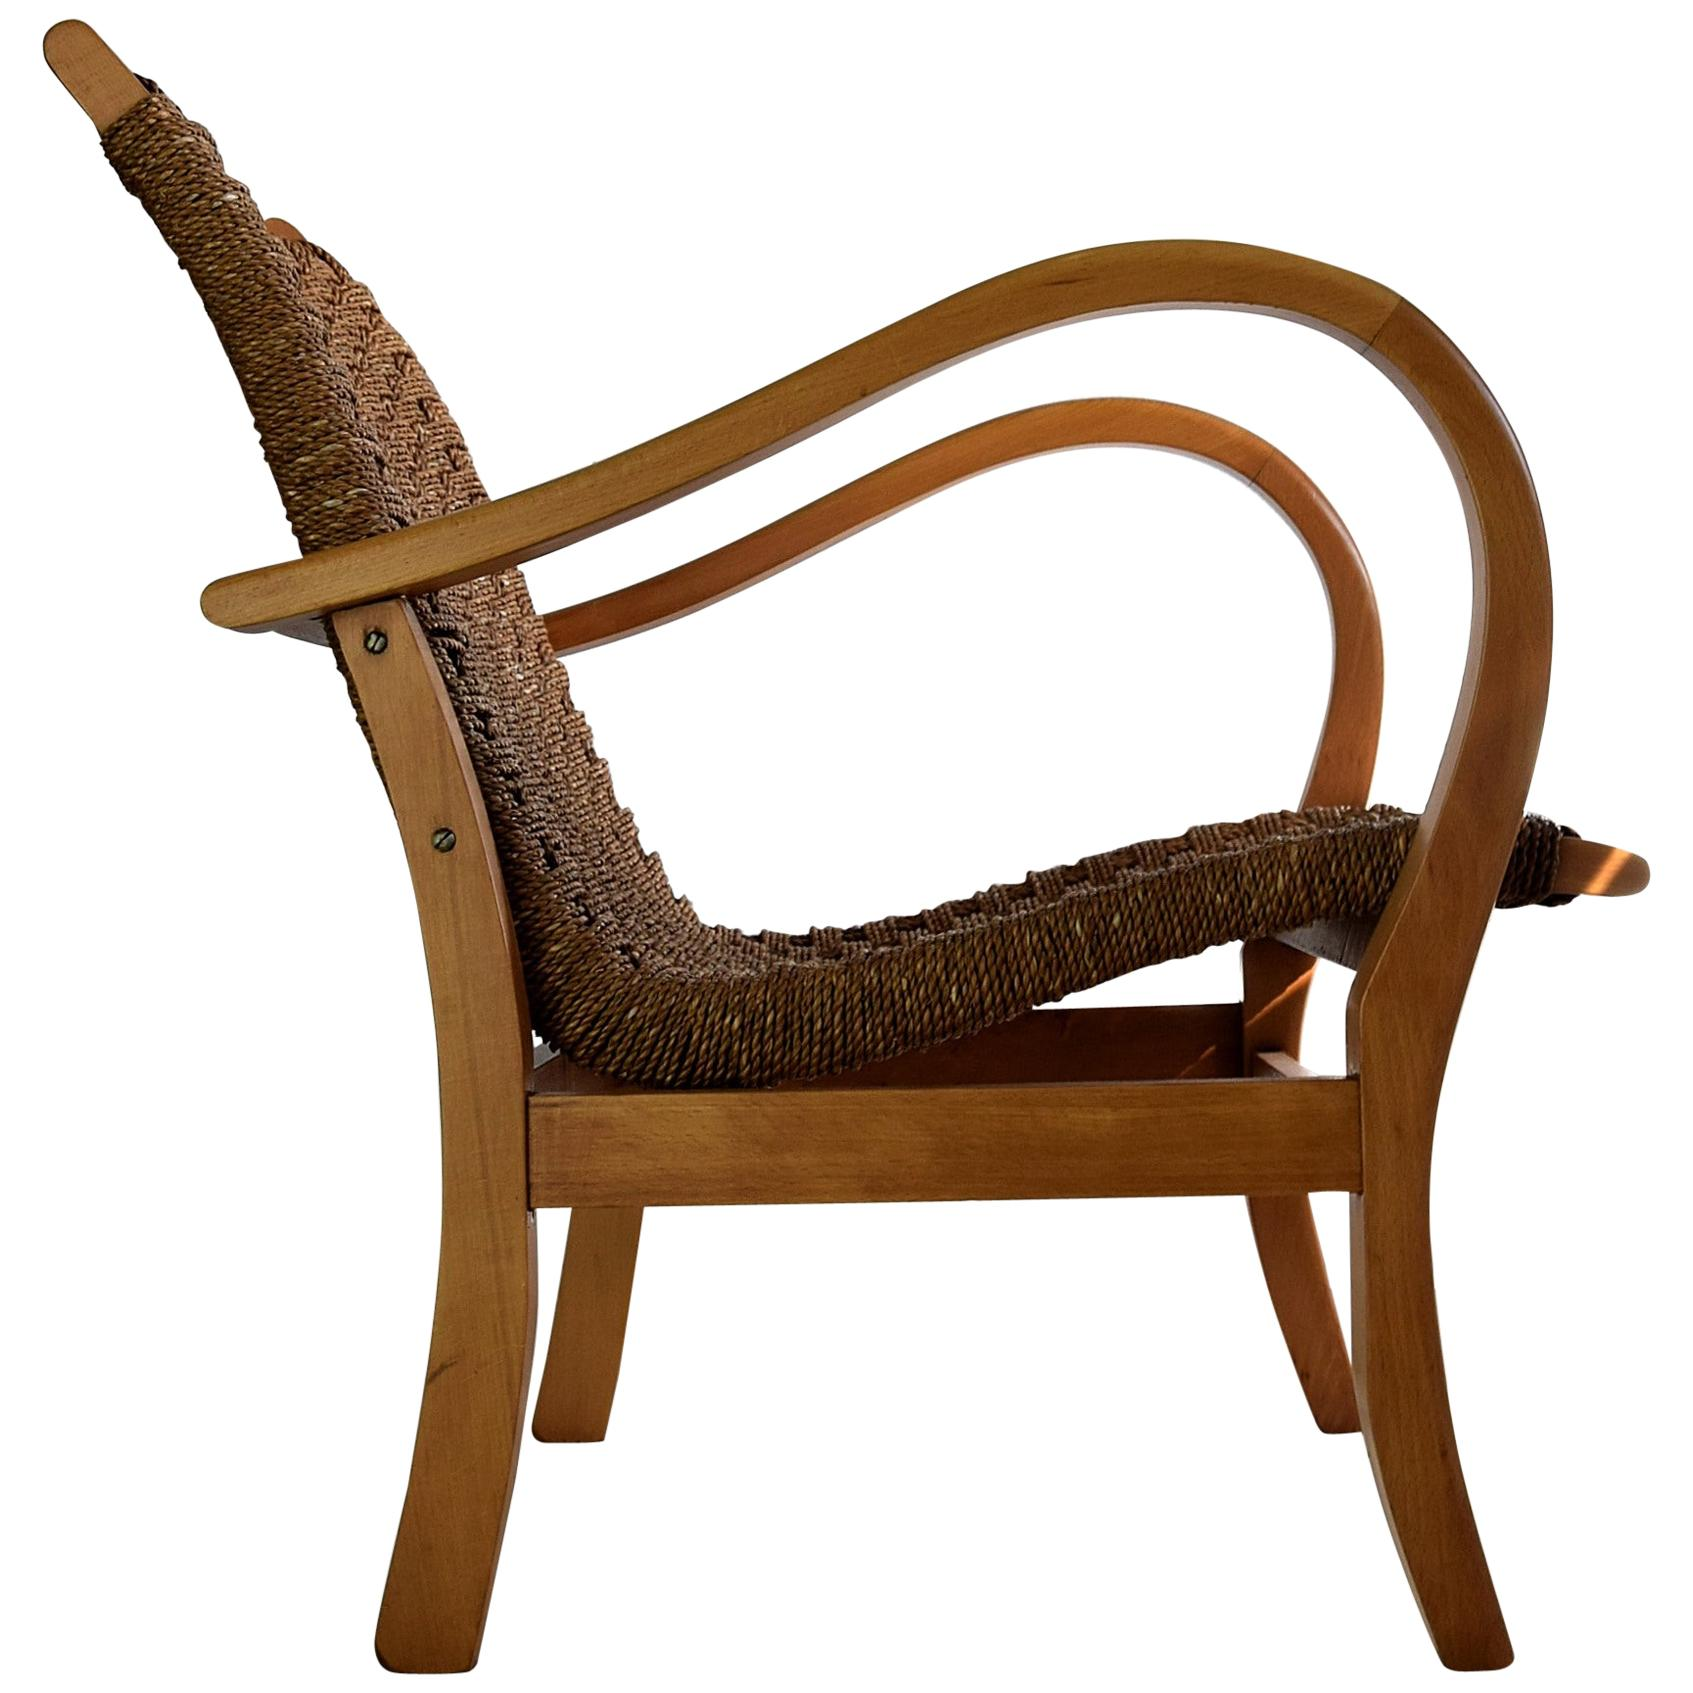 Bauhaus Armchair by Erich Dieckmann, 1925